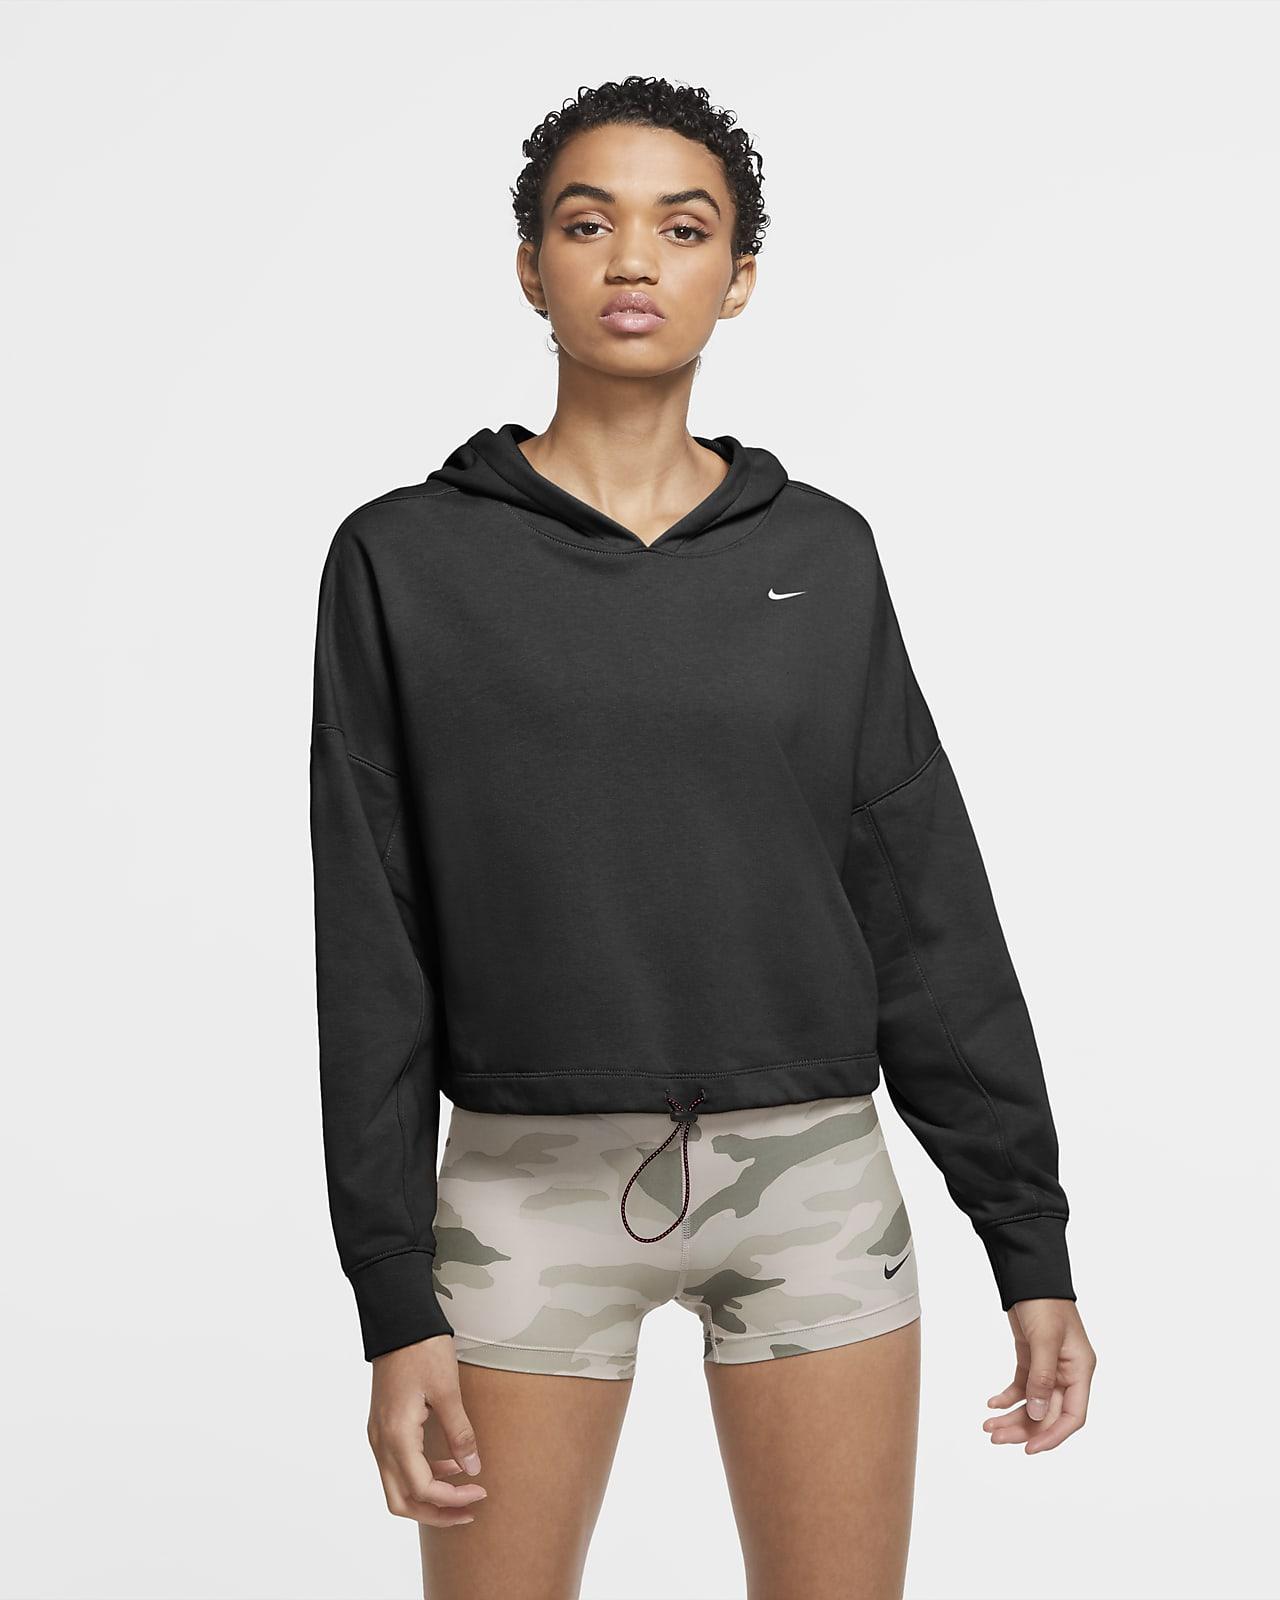 Nike Icon Clash 女子短款训练连帽衫